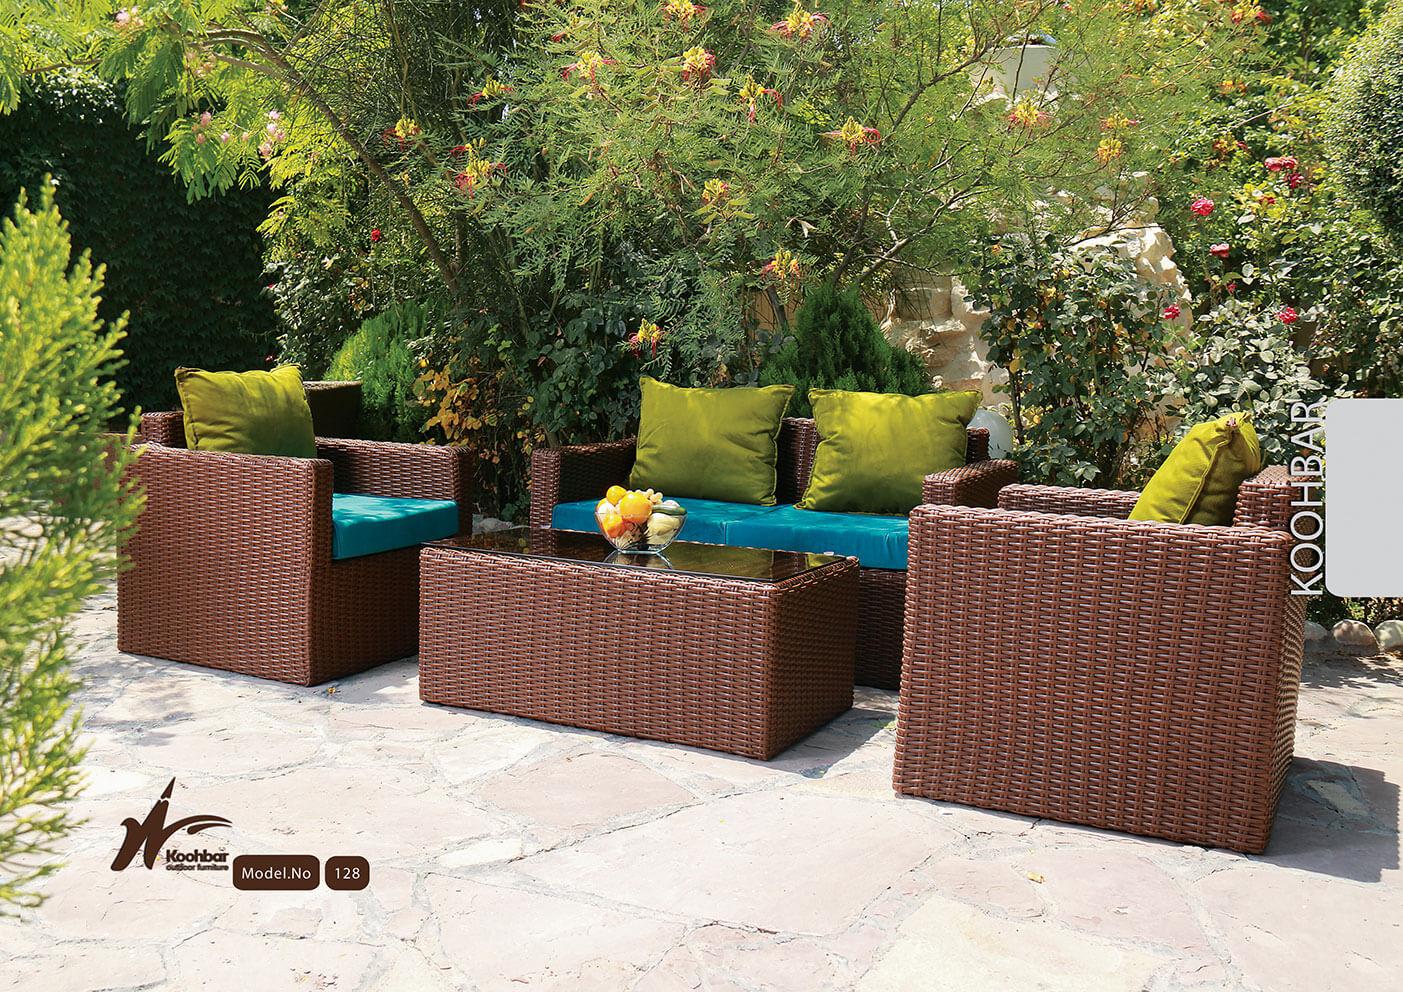 kohbar patio conversation sets 128 model0 - ست مبلمان حیاط کوهبر مدل ۱۲۸ - - patio-conversation-sets